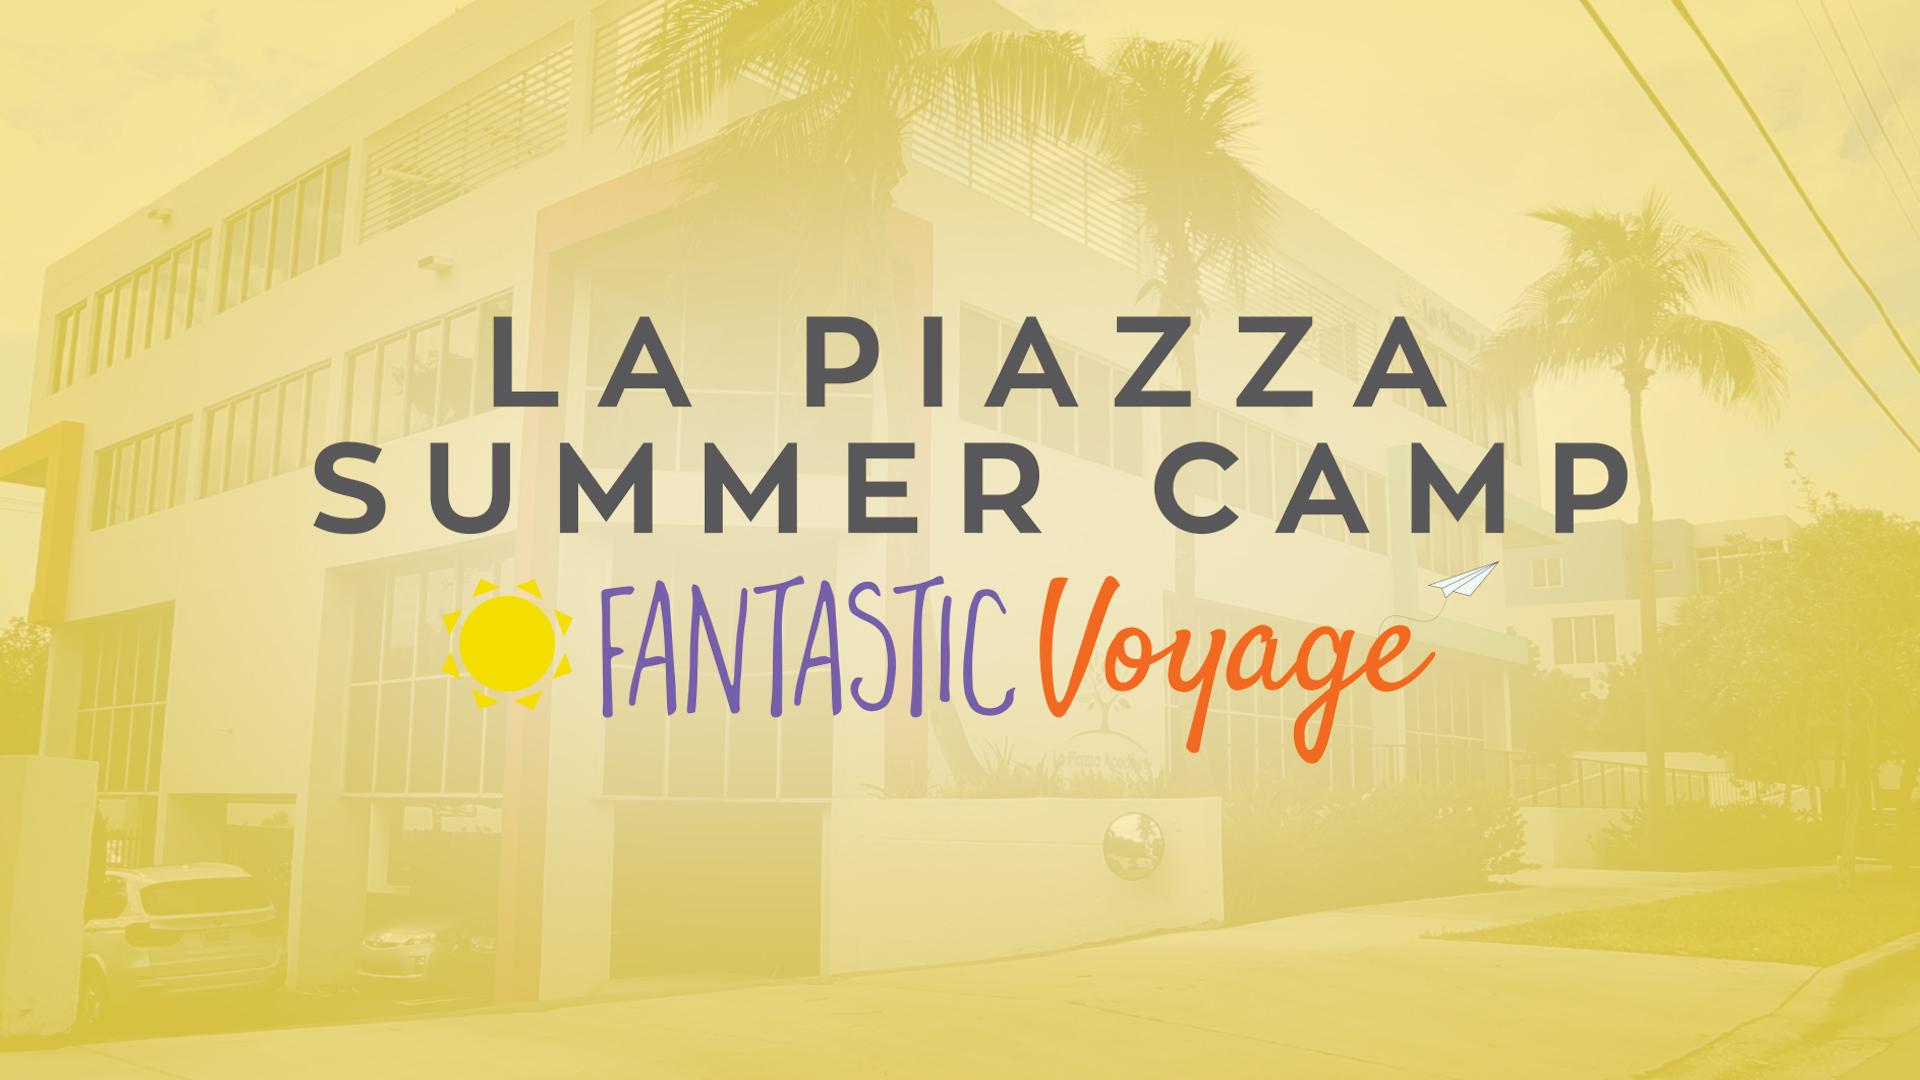 Summer Camp - La Piazza Academy - Preschool | Elementary